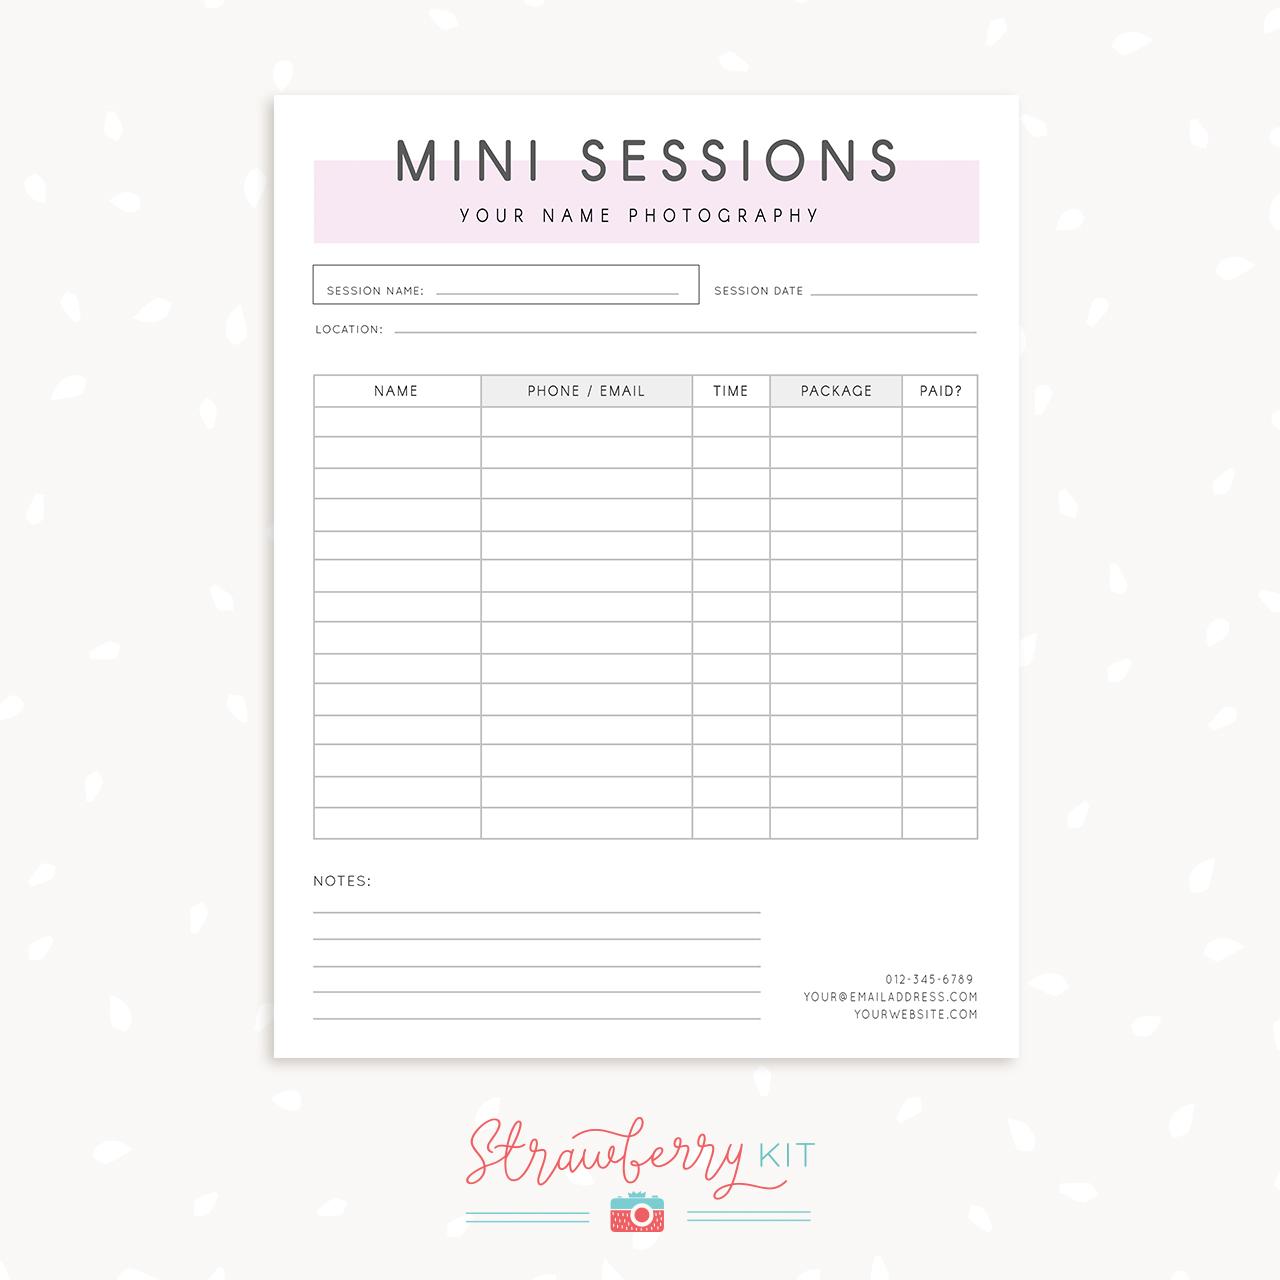 Mini session sign up form strawberry kit for Free mini session templates